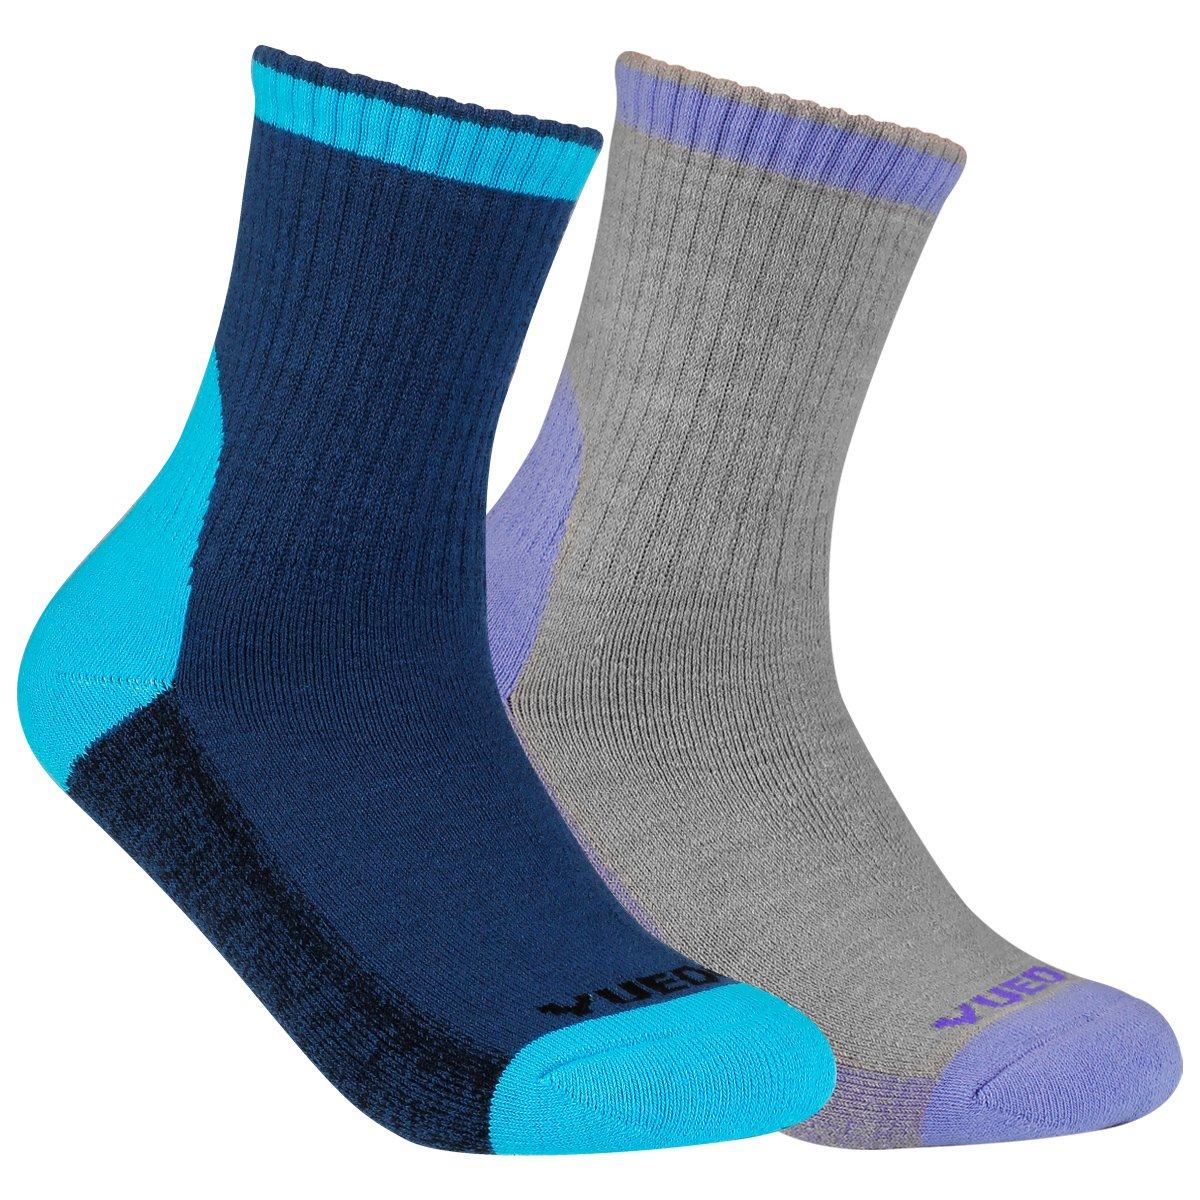 Women's Merino Wool Hiking Walking Socks - YUEDGE 2 Pairs Warm Wool Crew Socks Outdoor (2018 Newest Style)